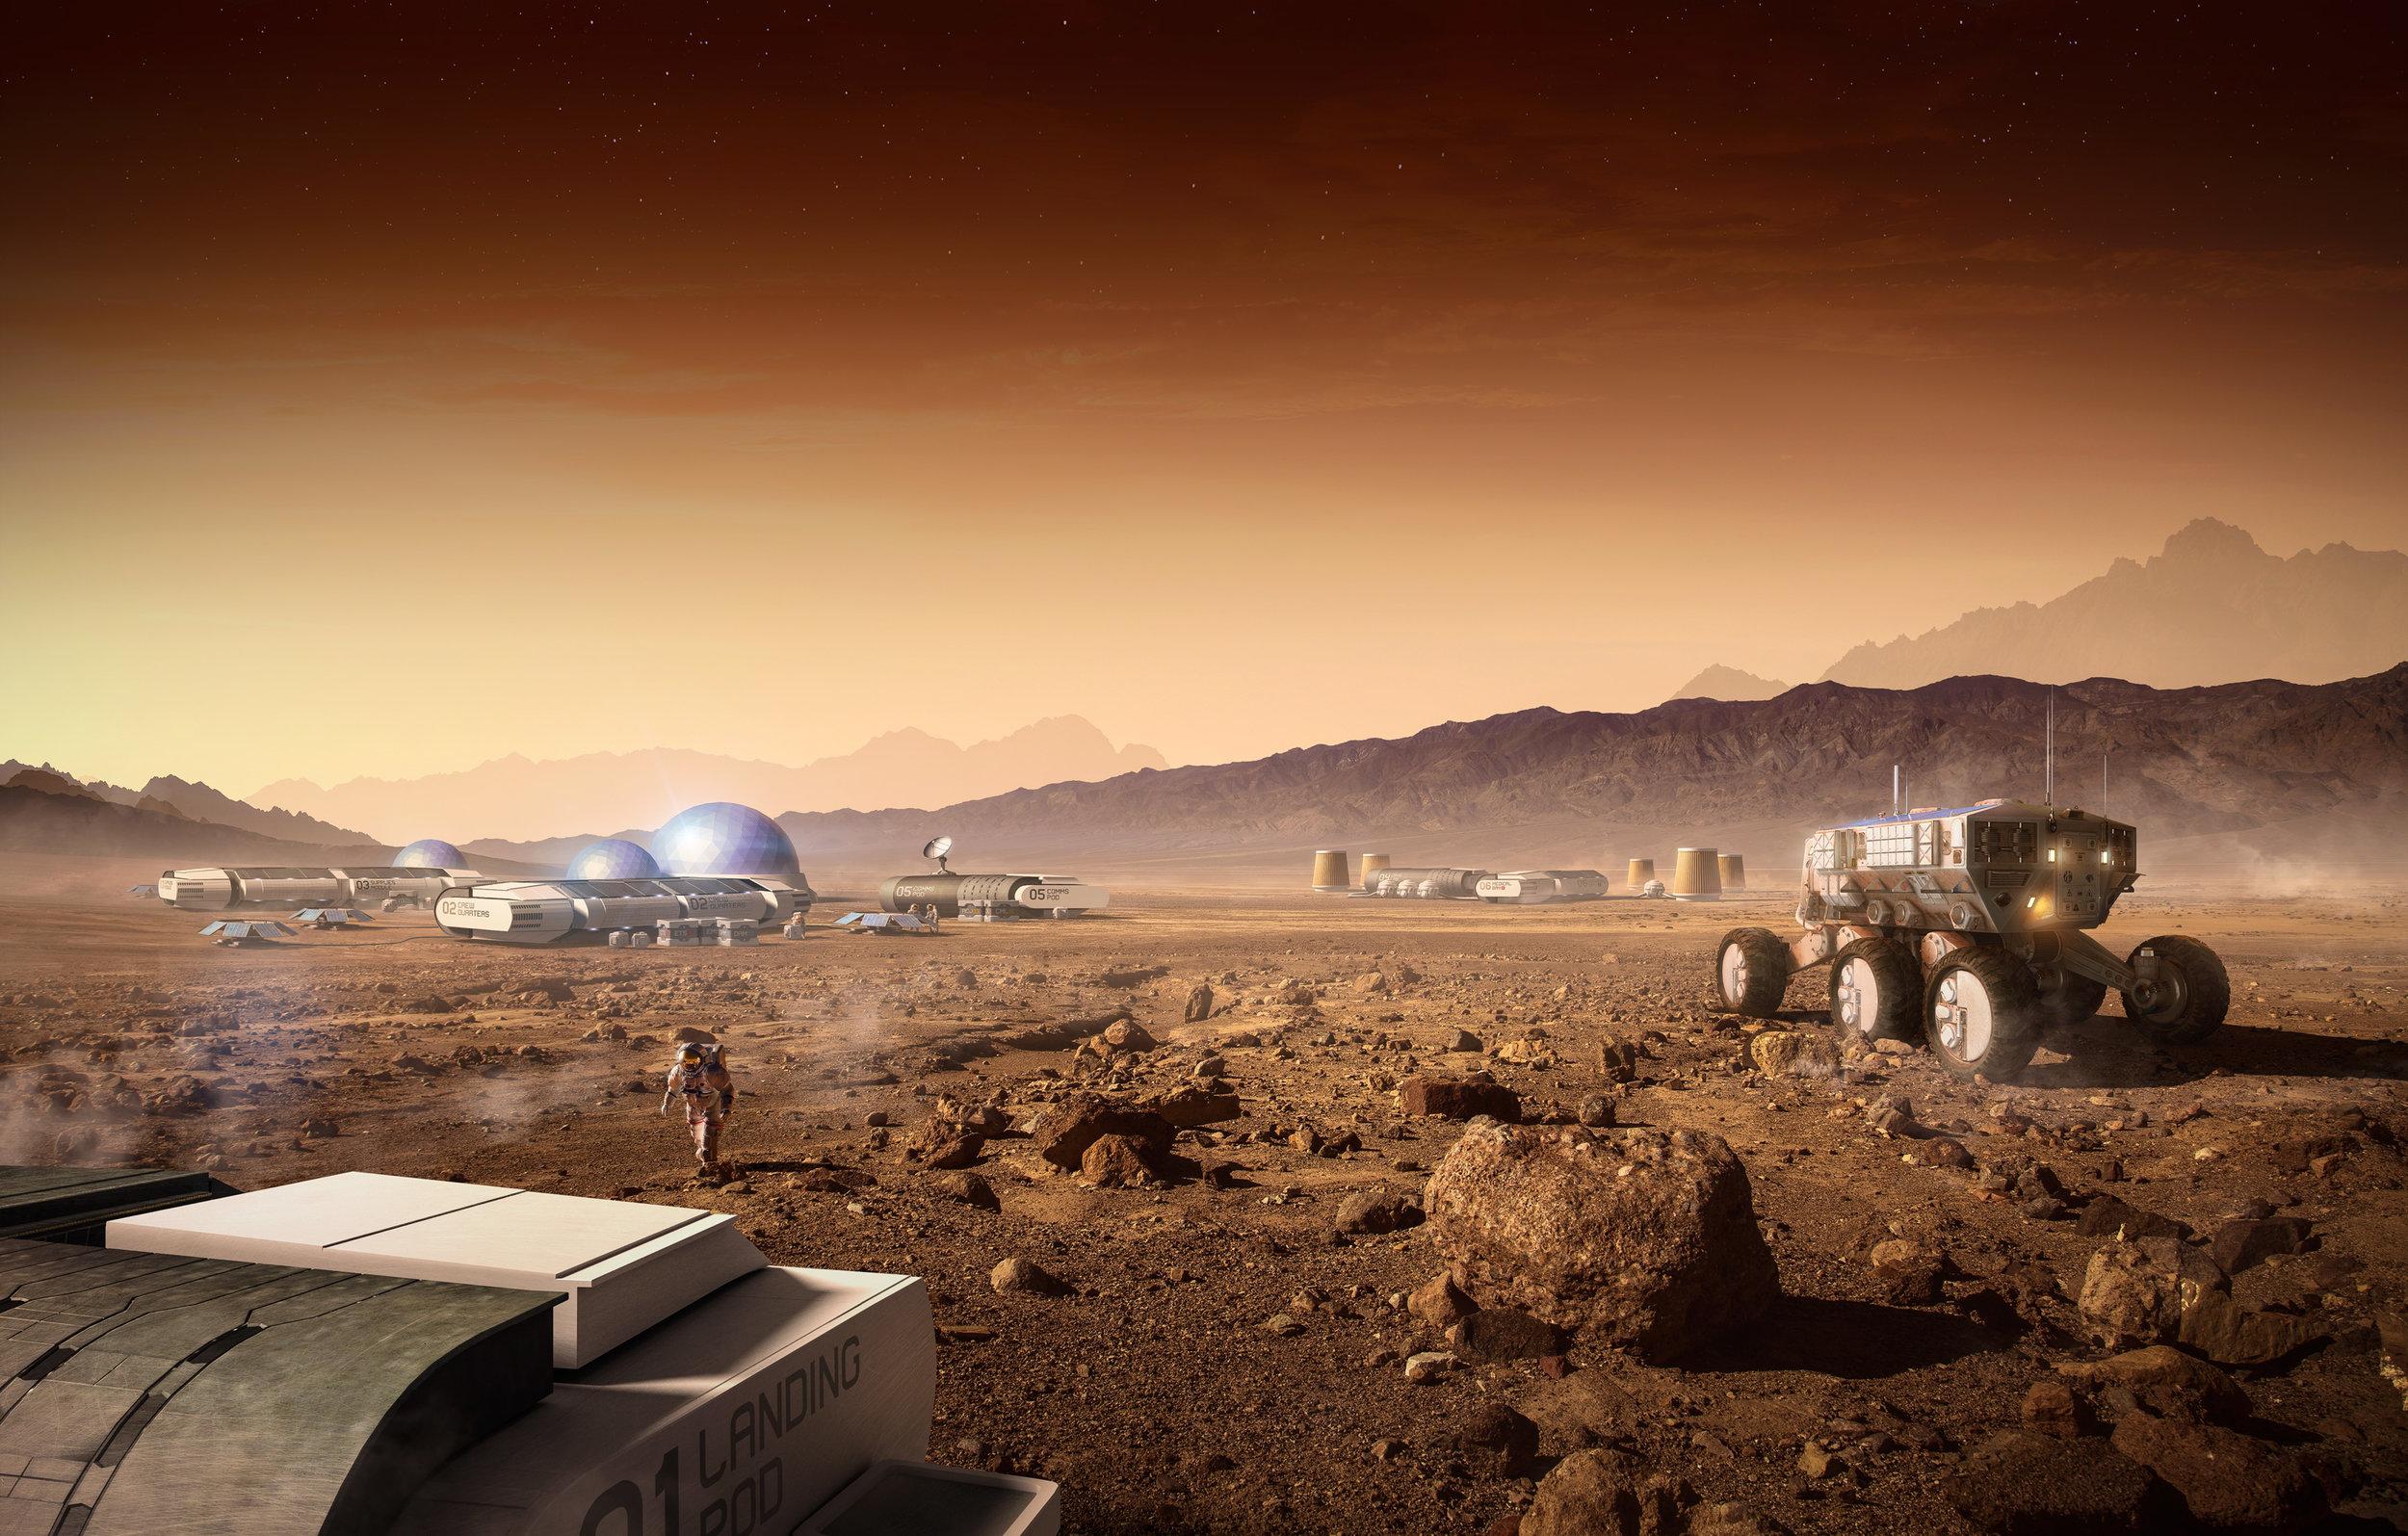 Mars, a New Earth